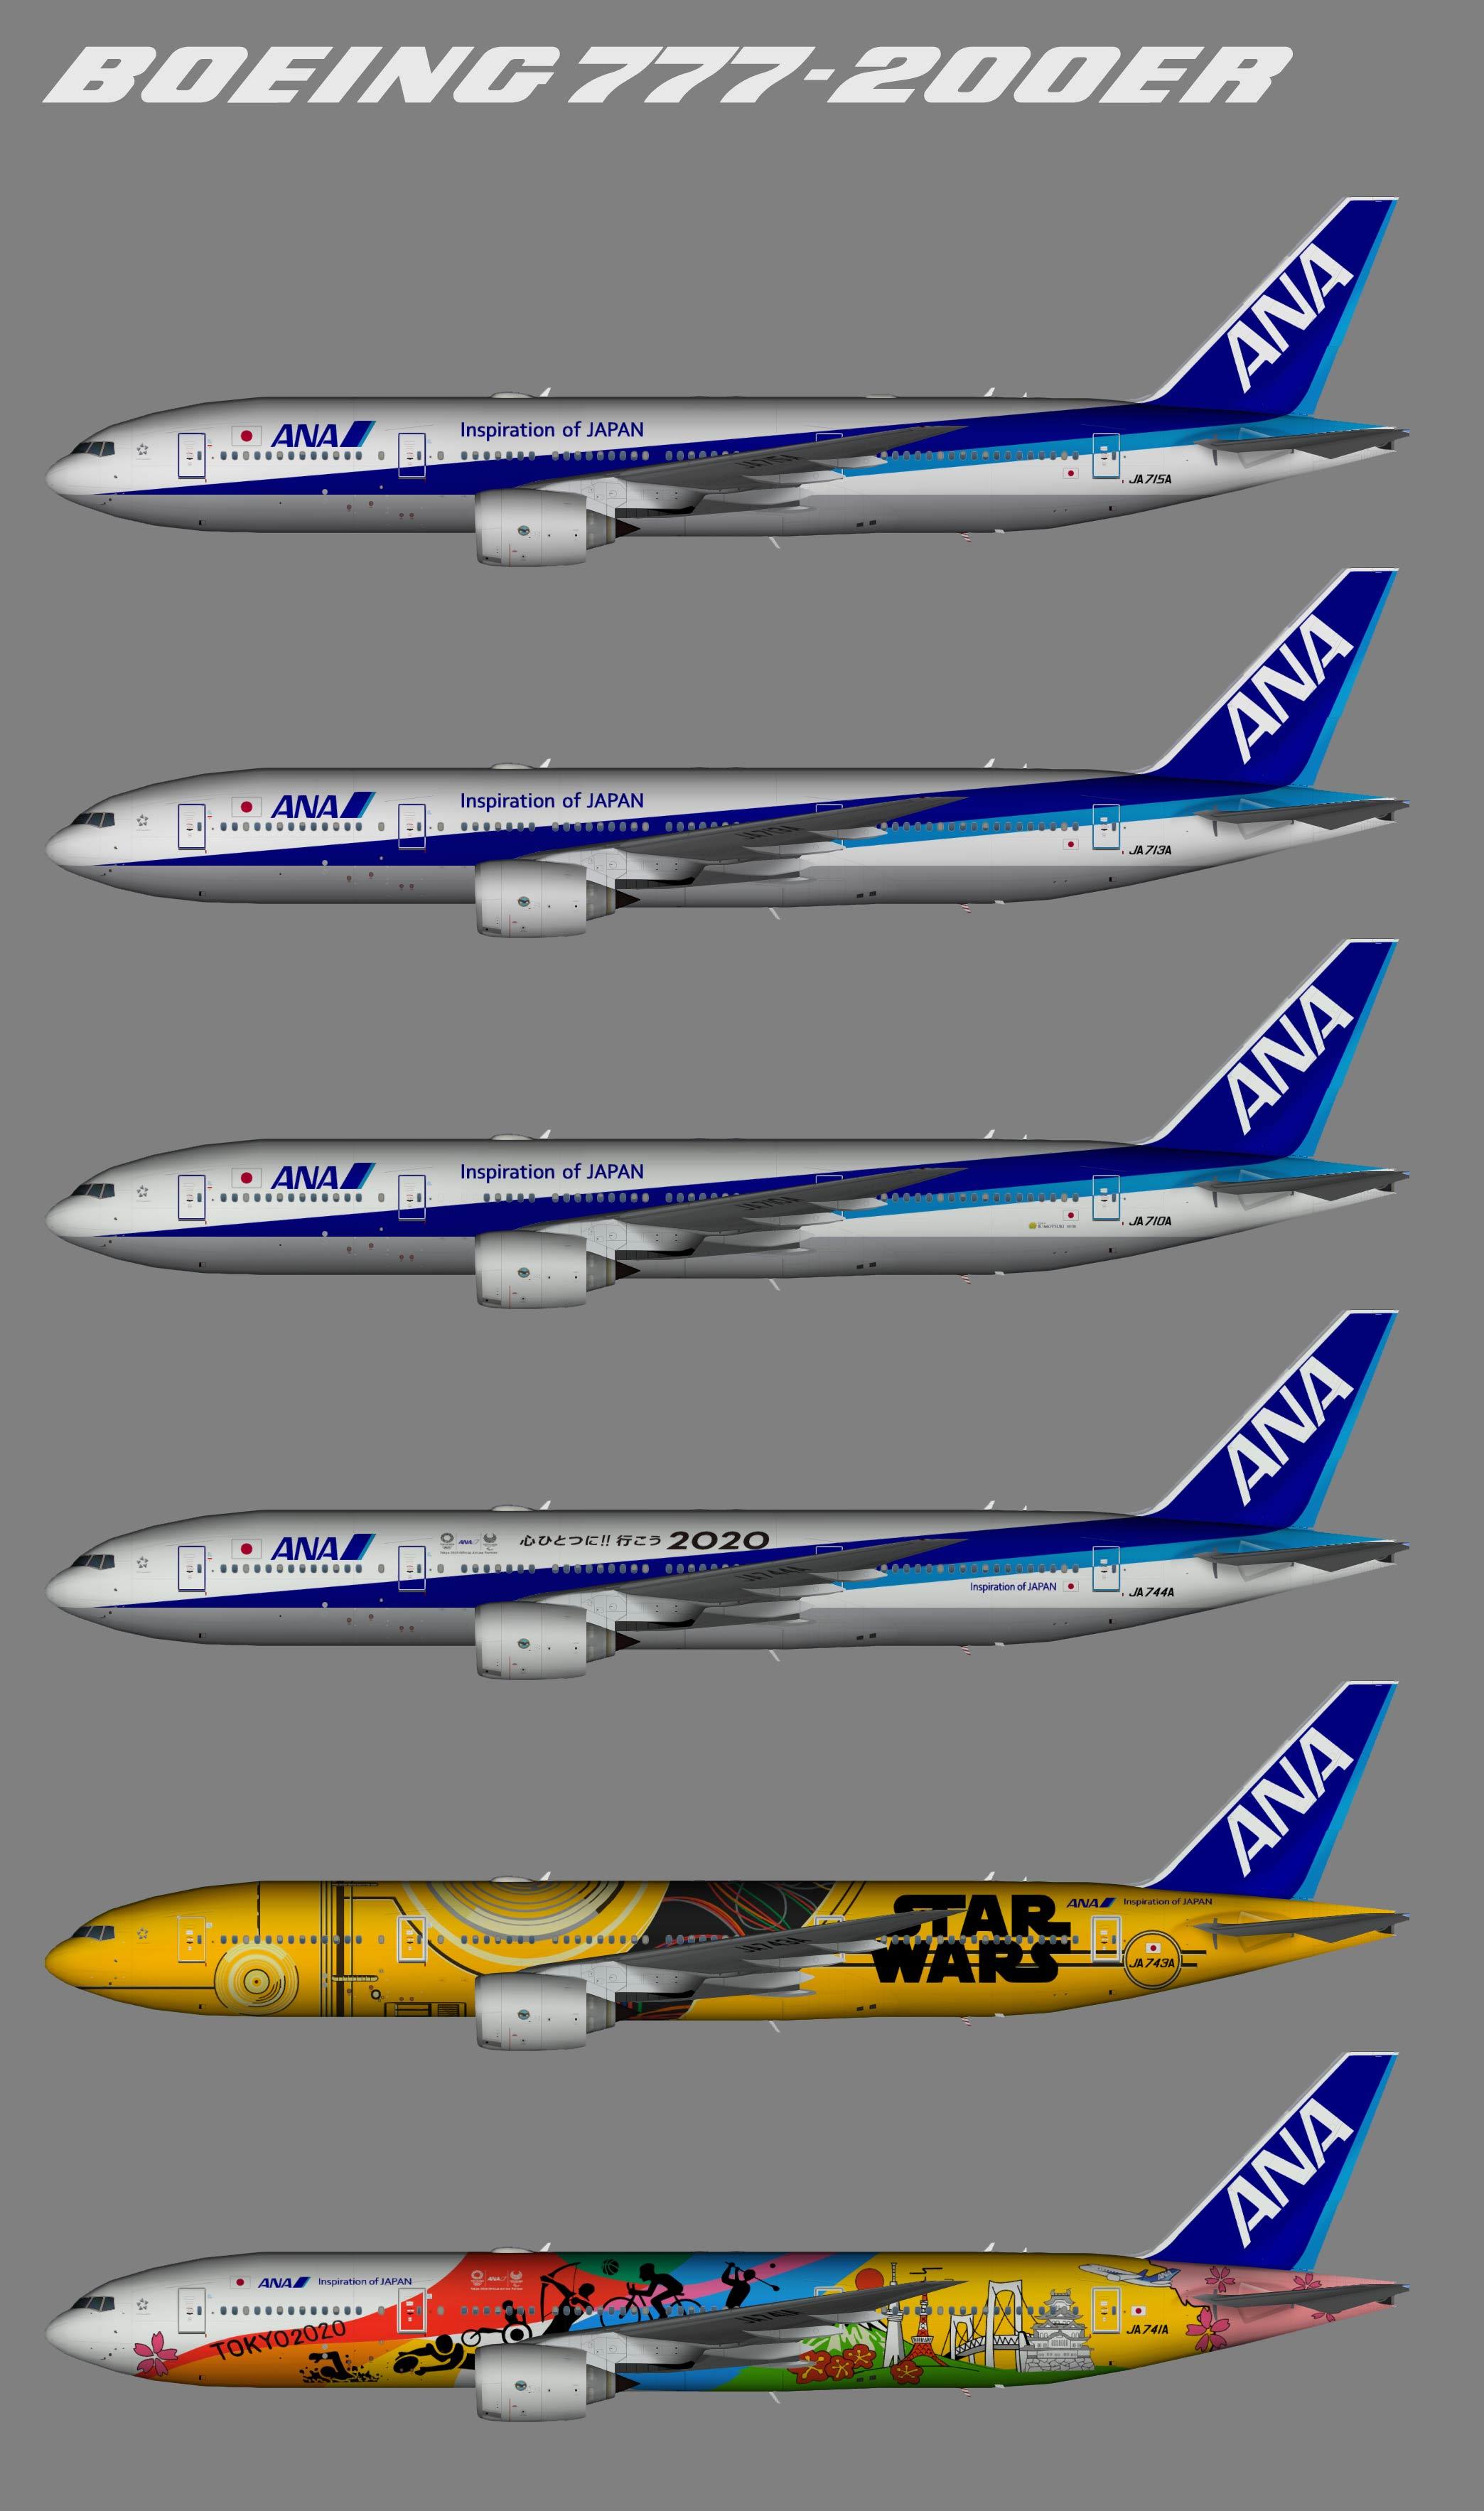 All Nippon Airways (ANA) Boeing 777-200ER